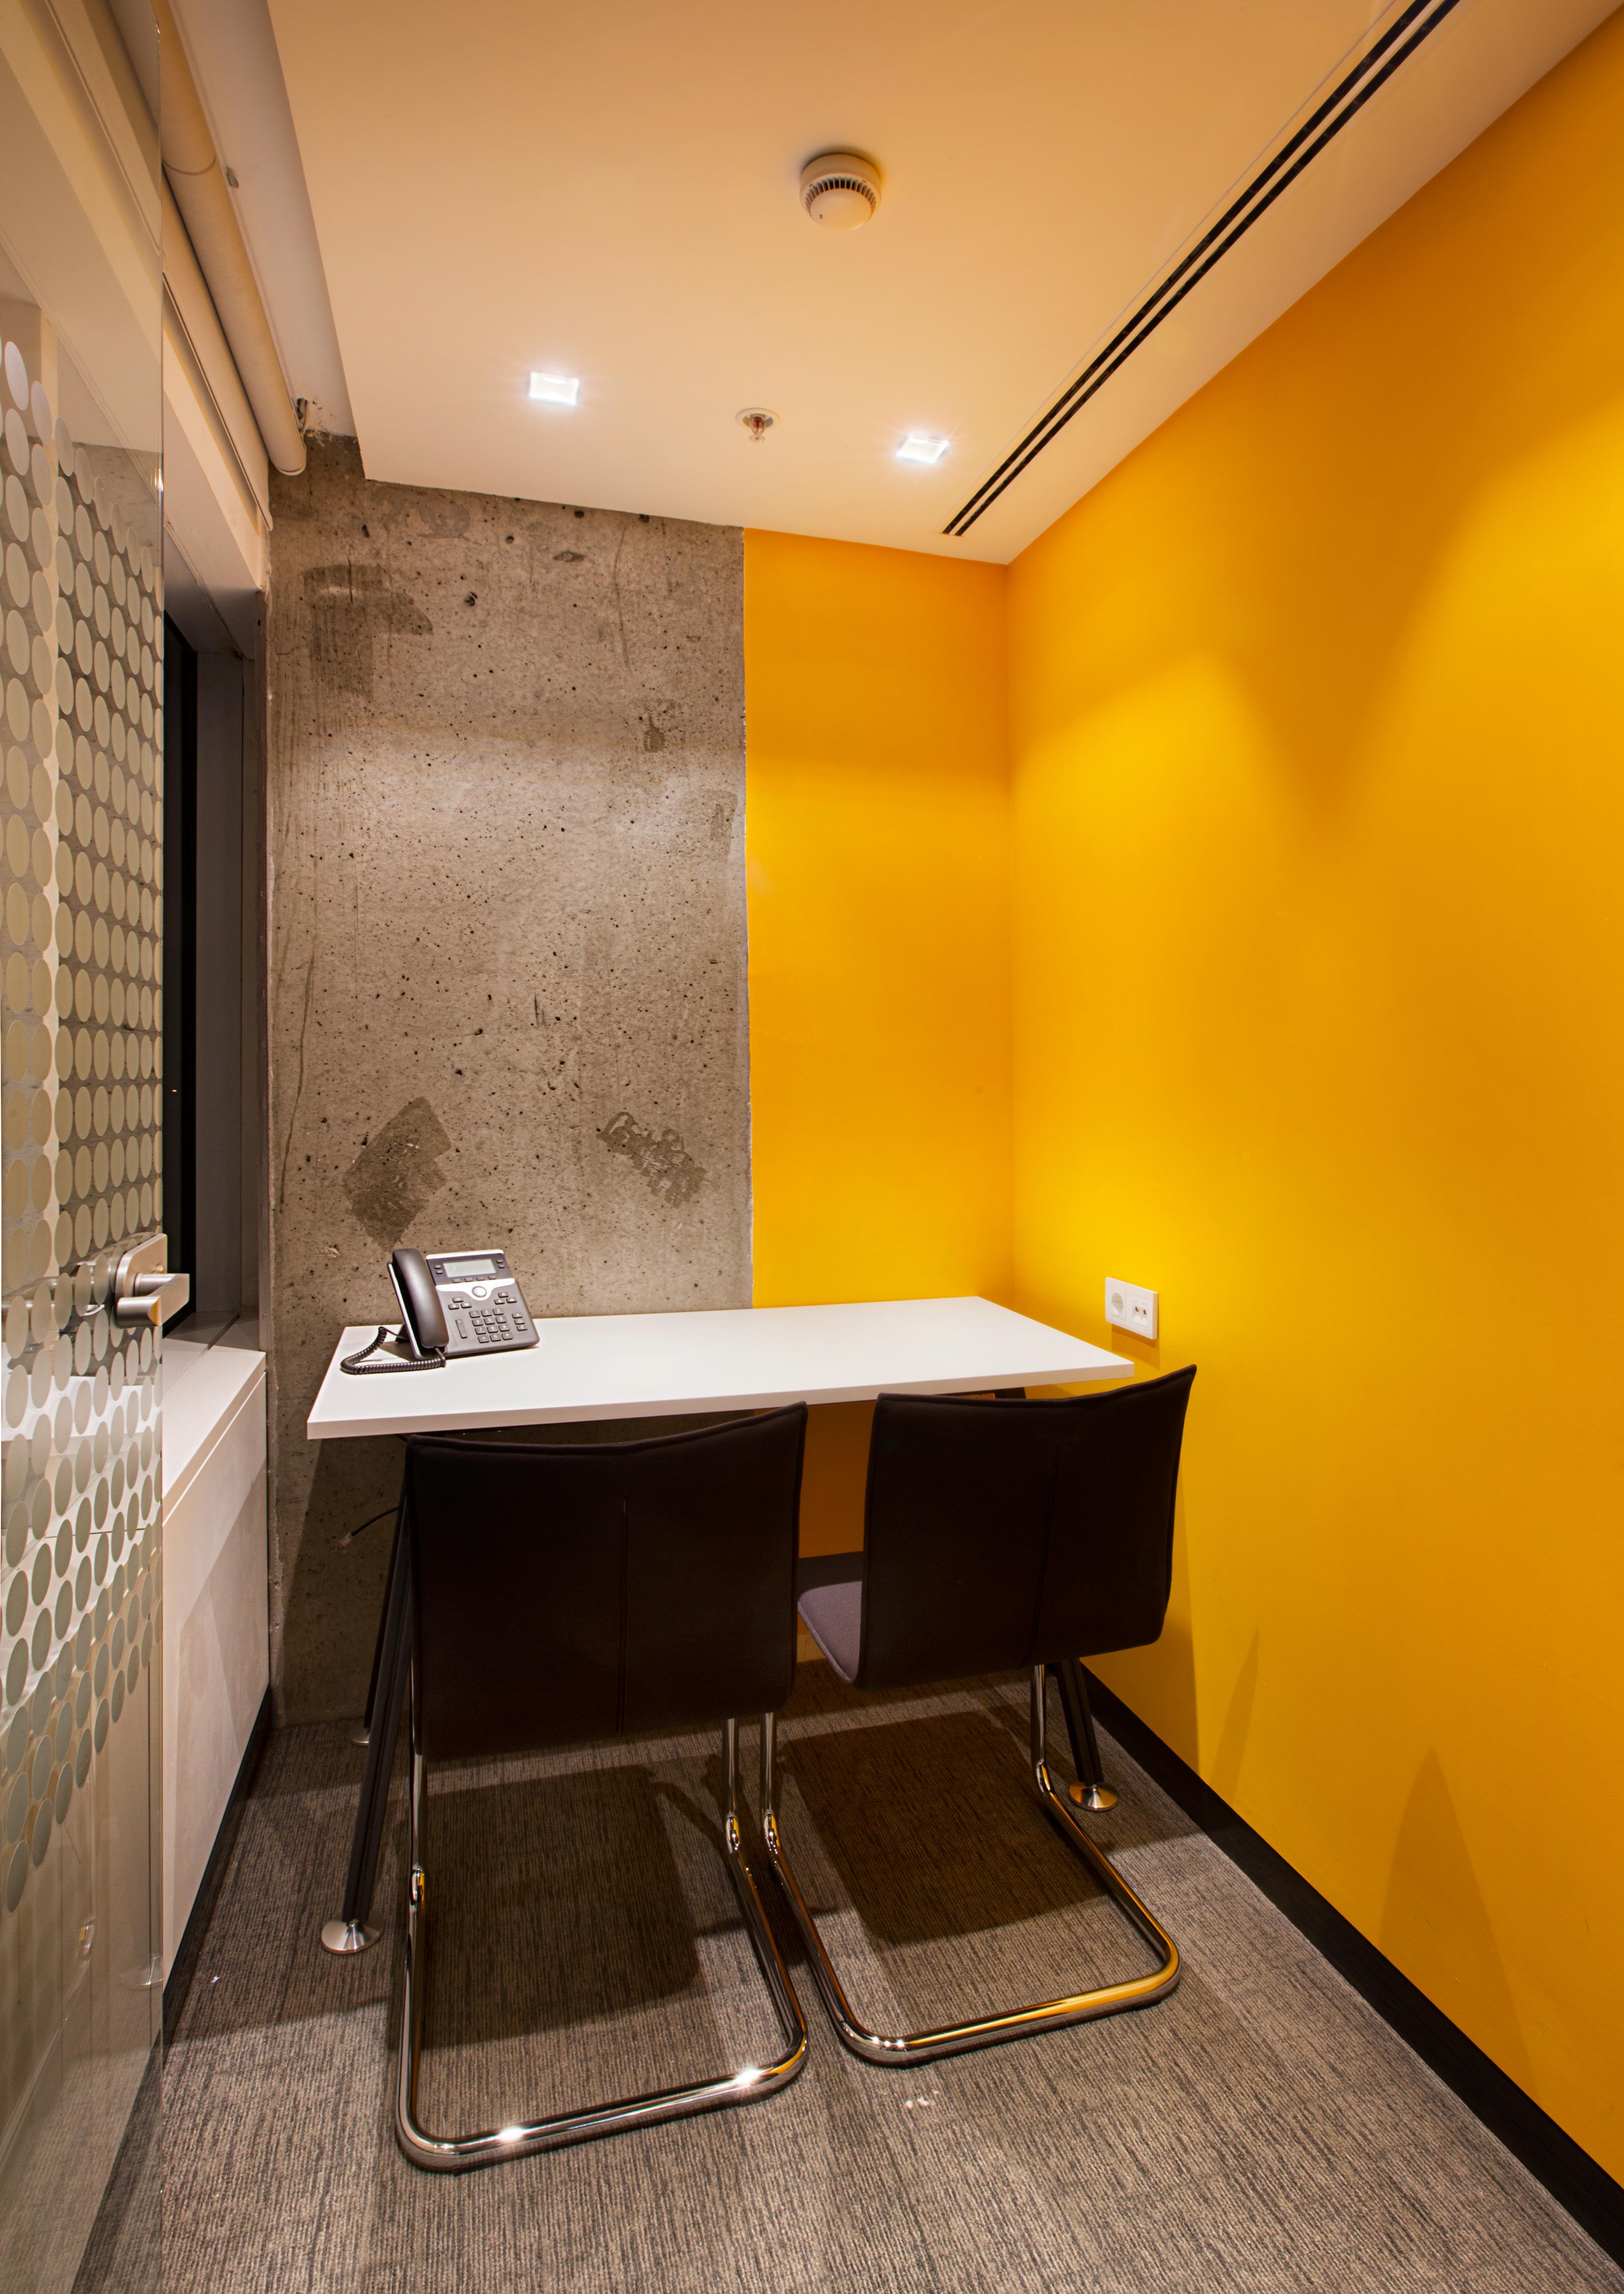 Avci+Architects-+INC+Research+Istanbul+Merkez+Ofisi-7